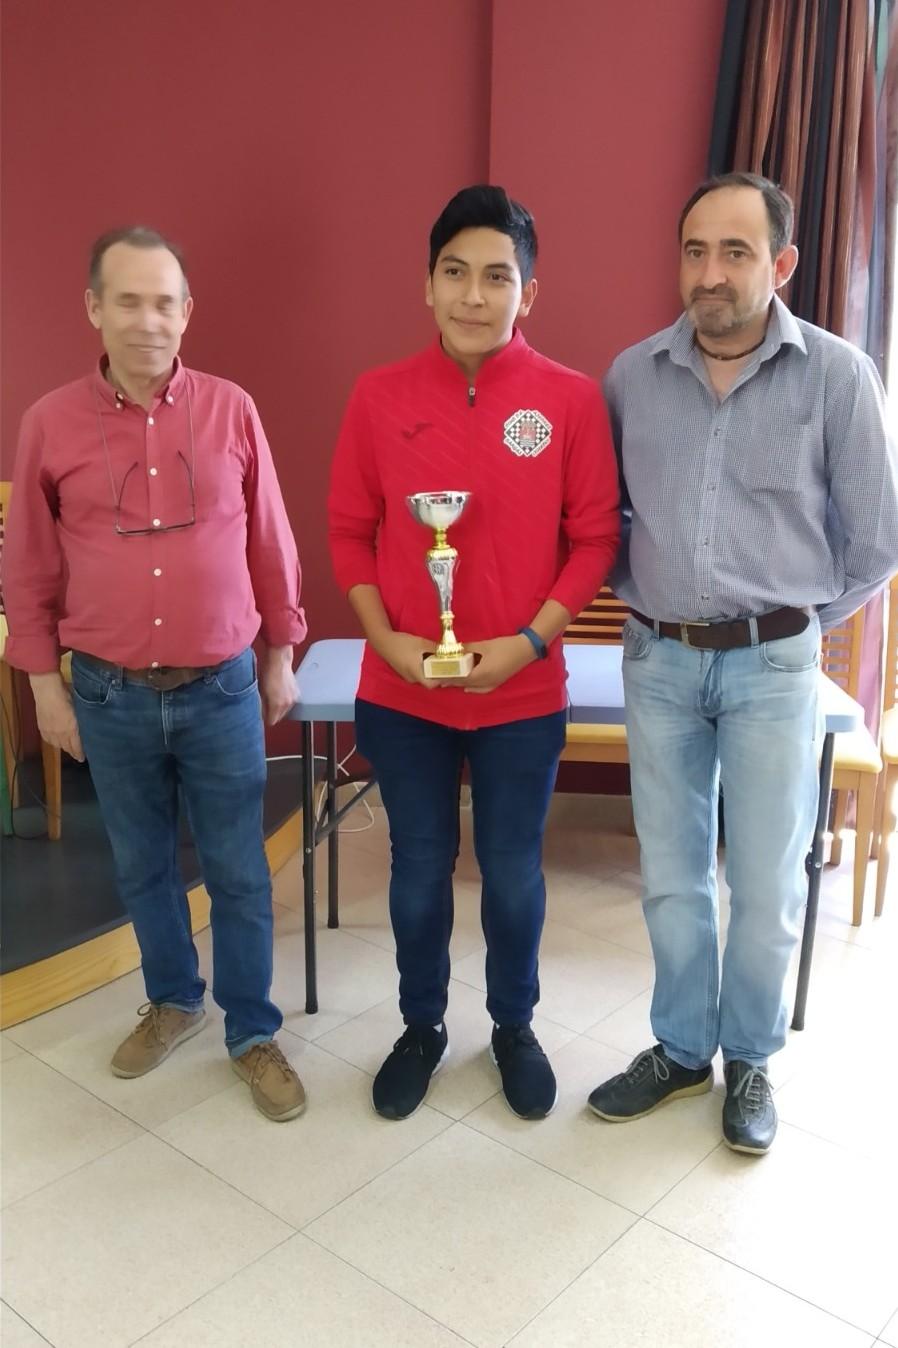 Luis campeón en Numancia